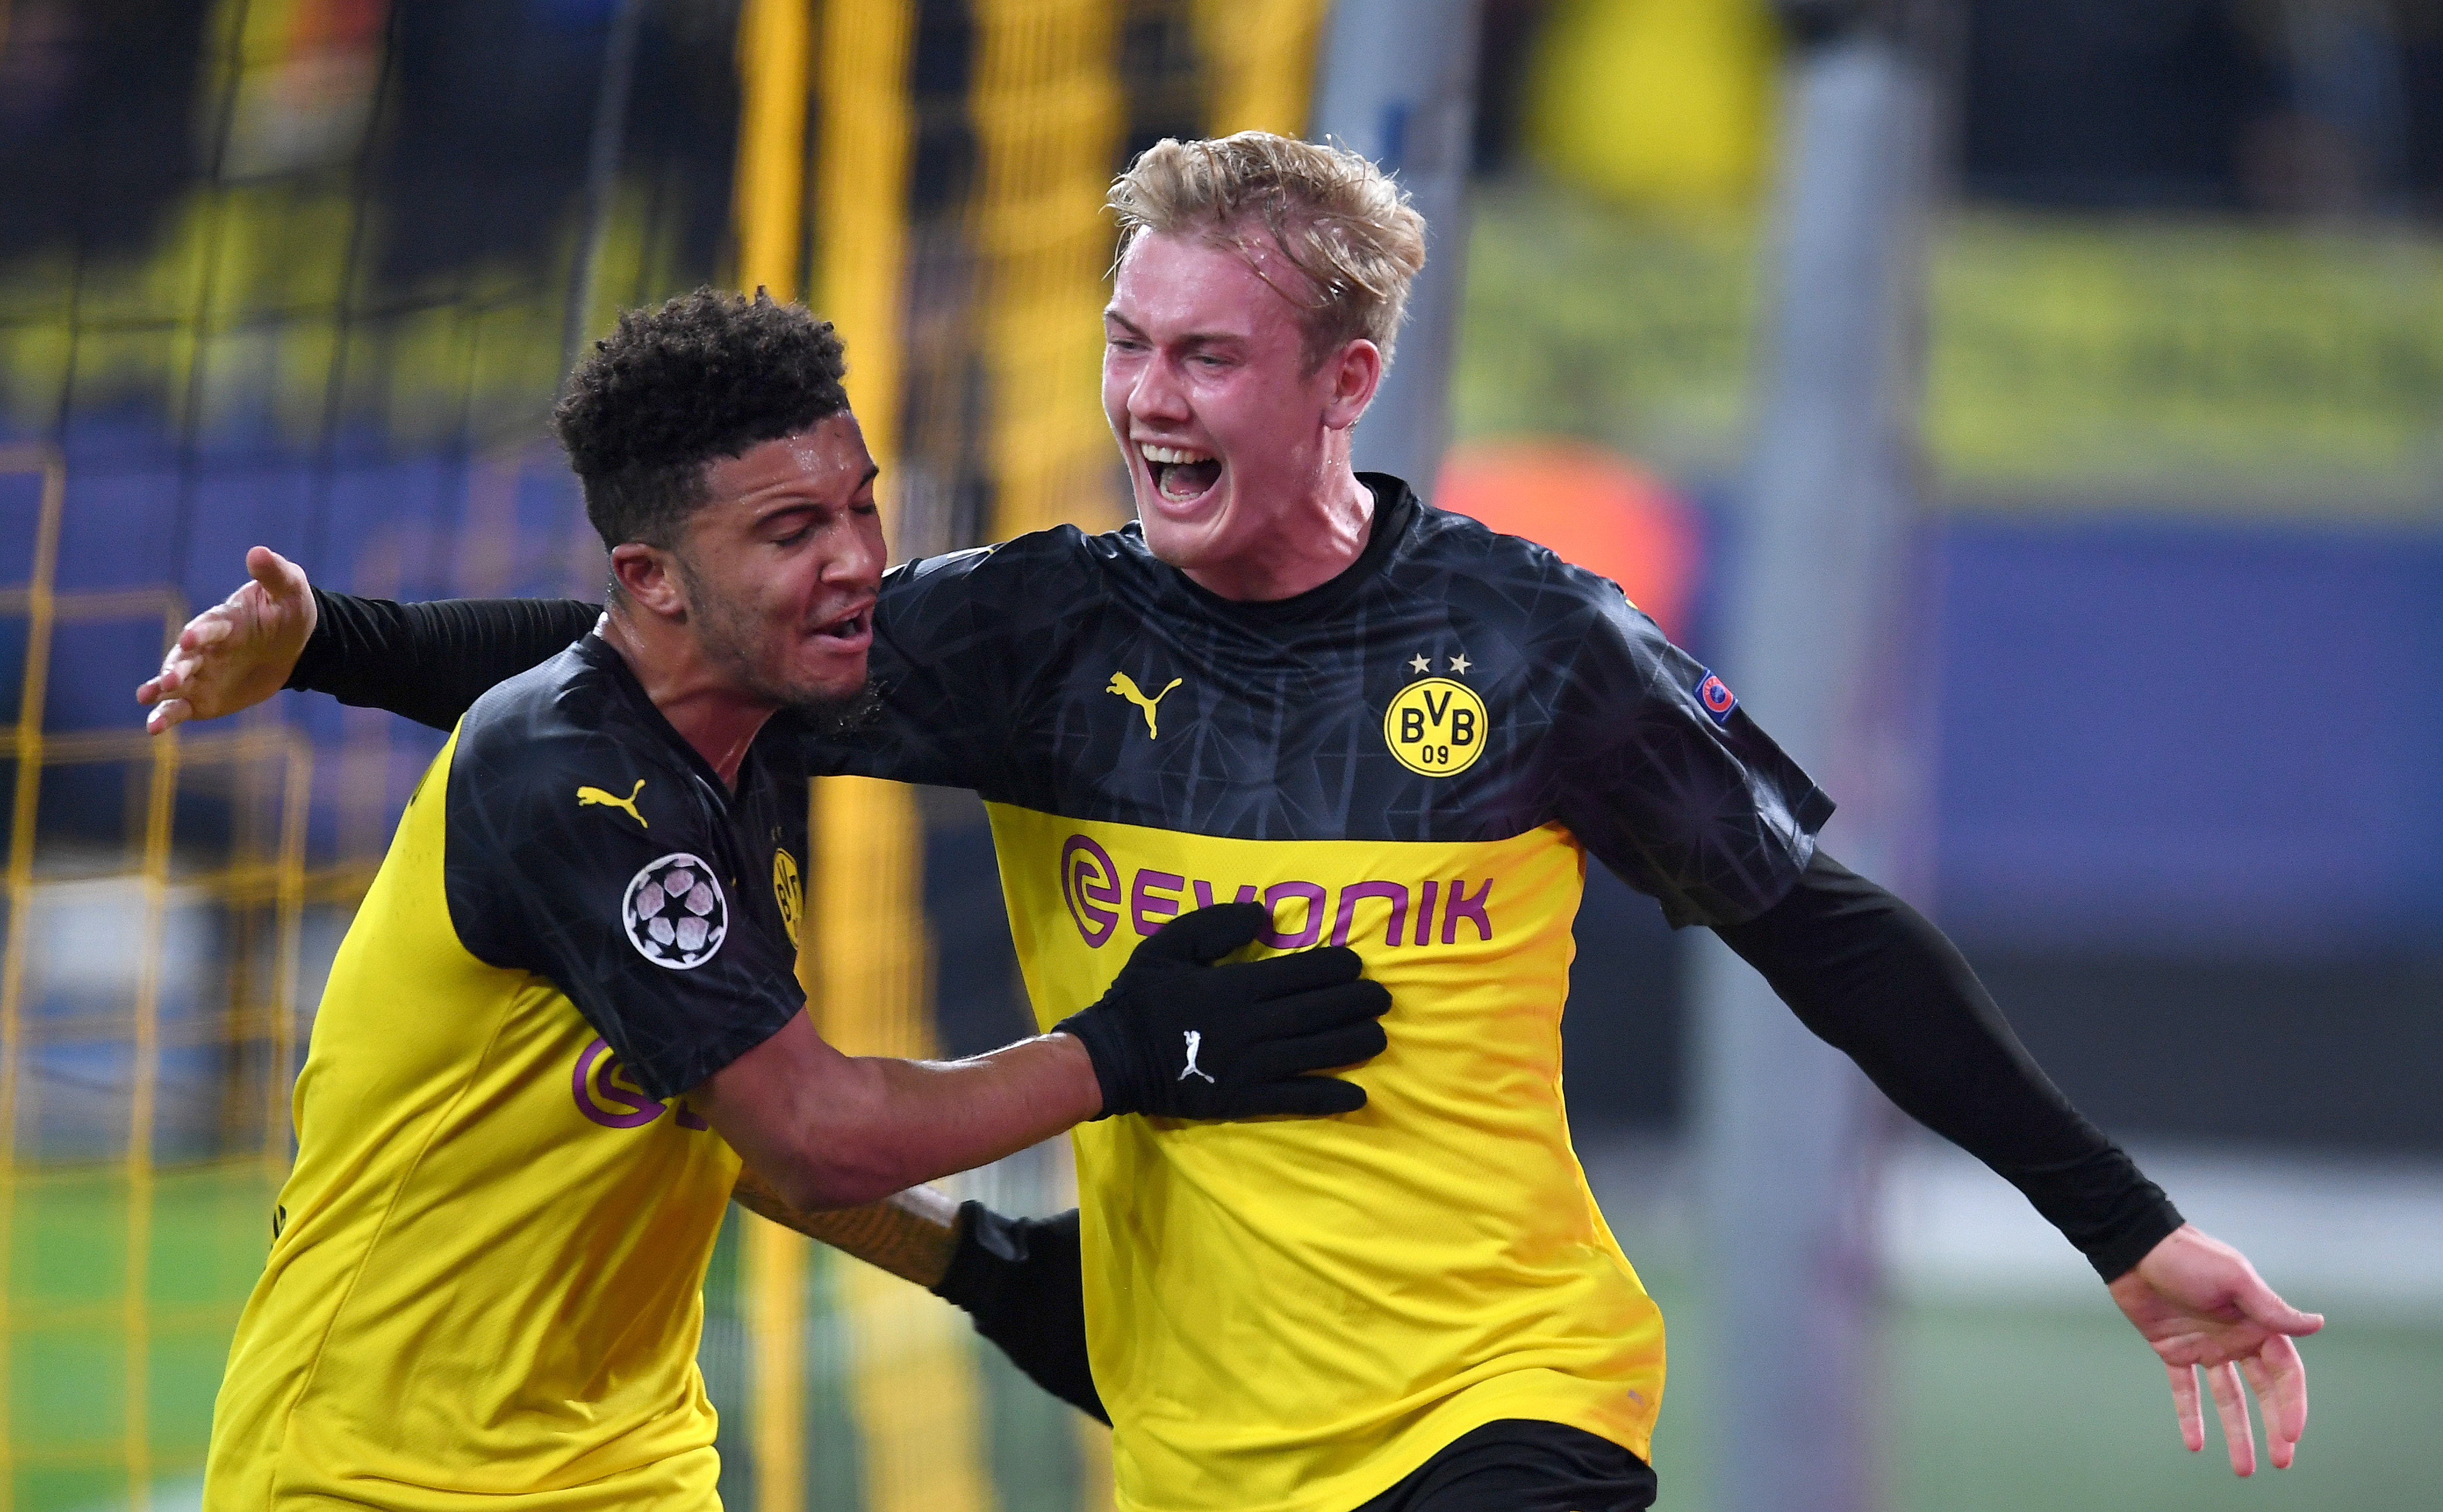 Julian Brandt of Borussia Dortmund celebrates after scoring his team's second goal with teammate Jadon Sancho.